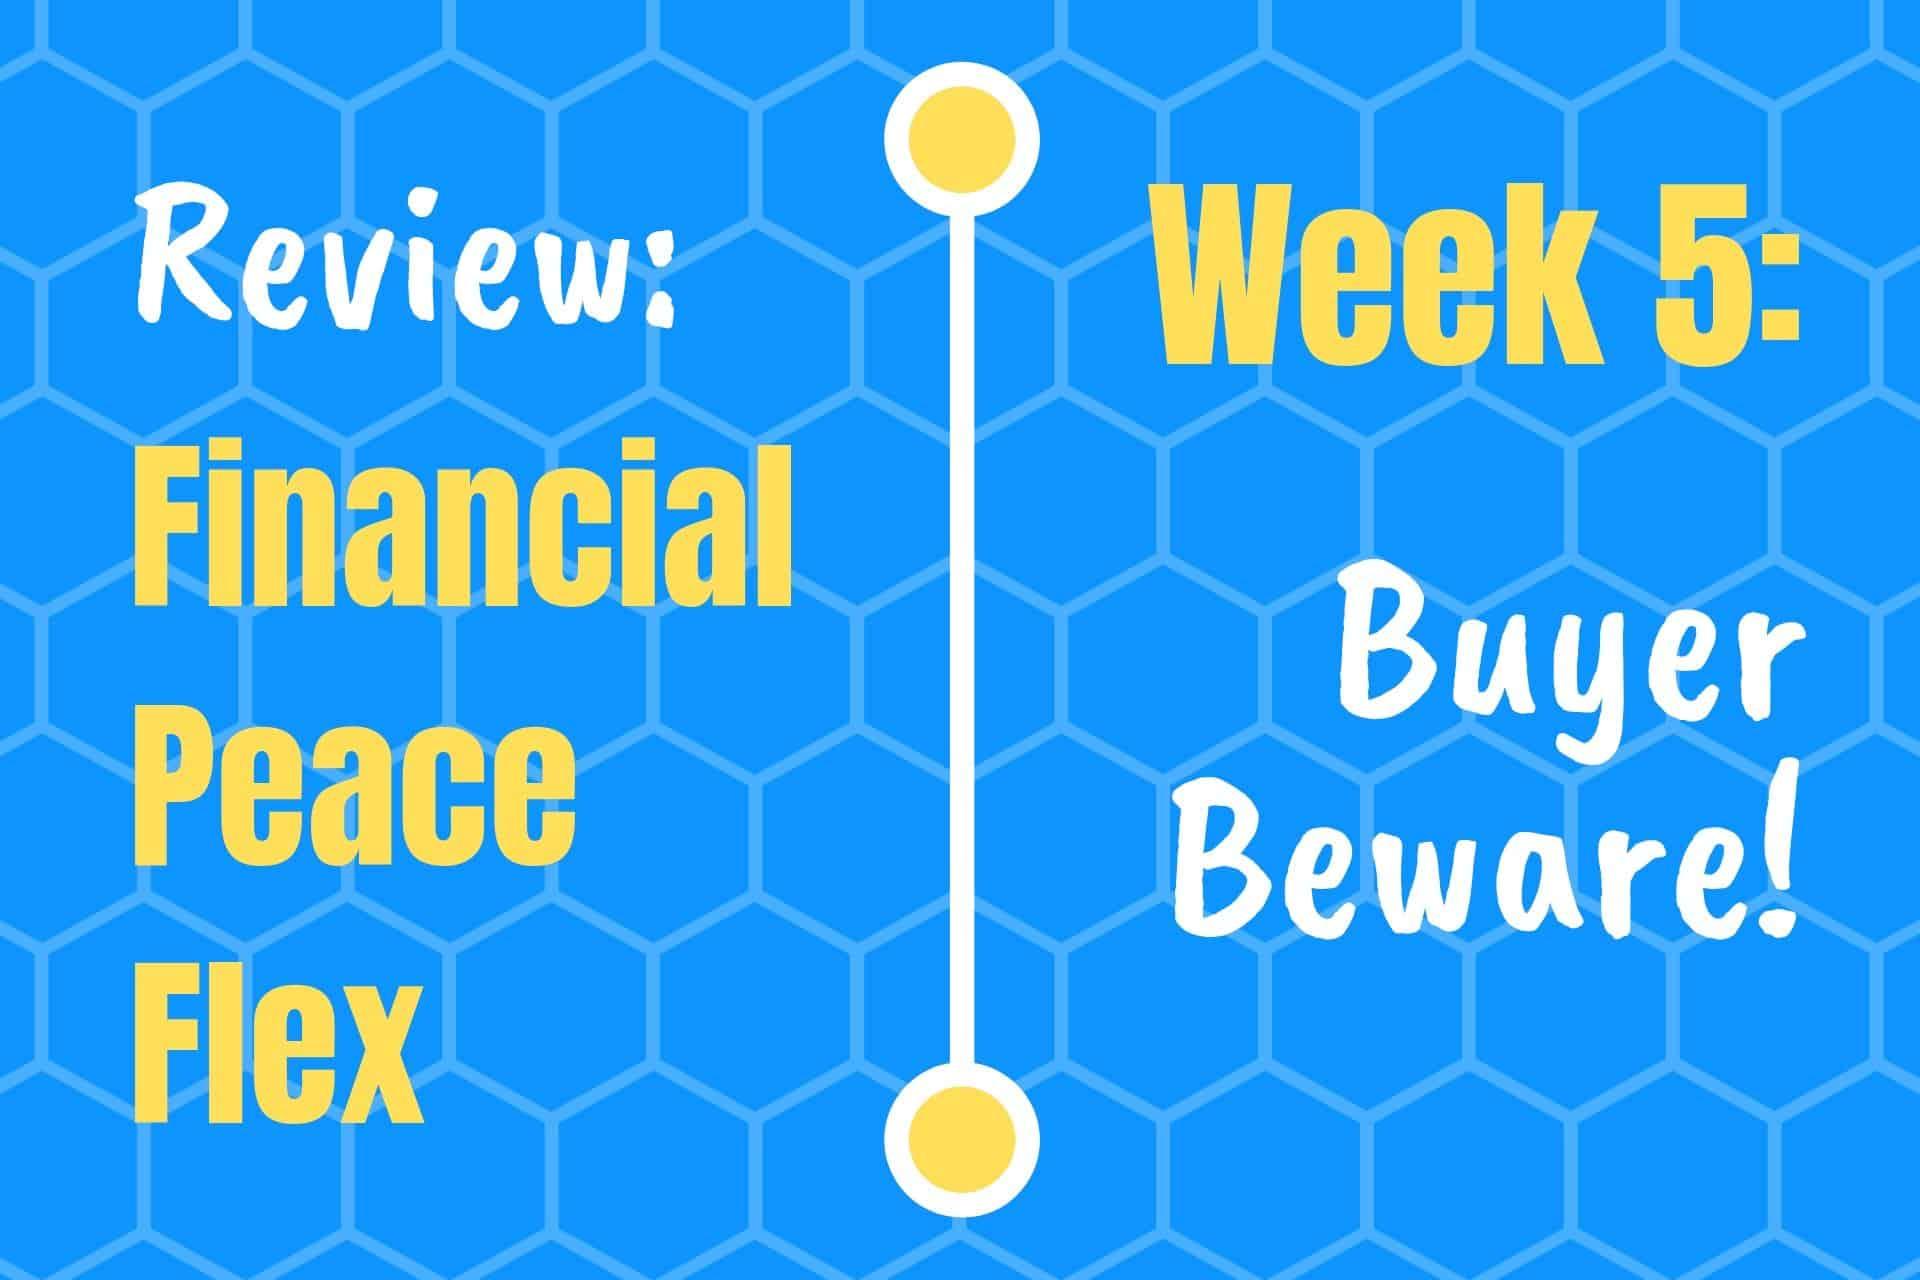 Financial peace university week 5 review